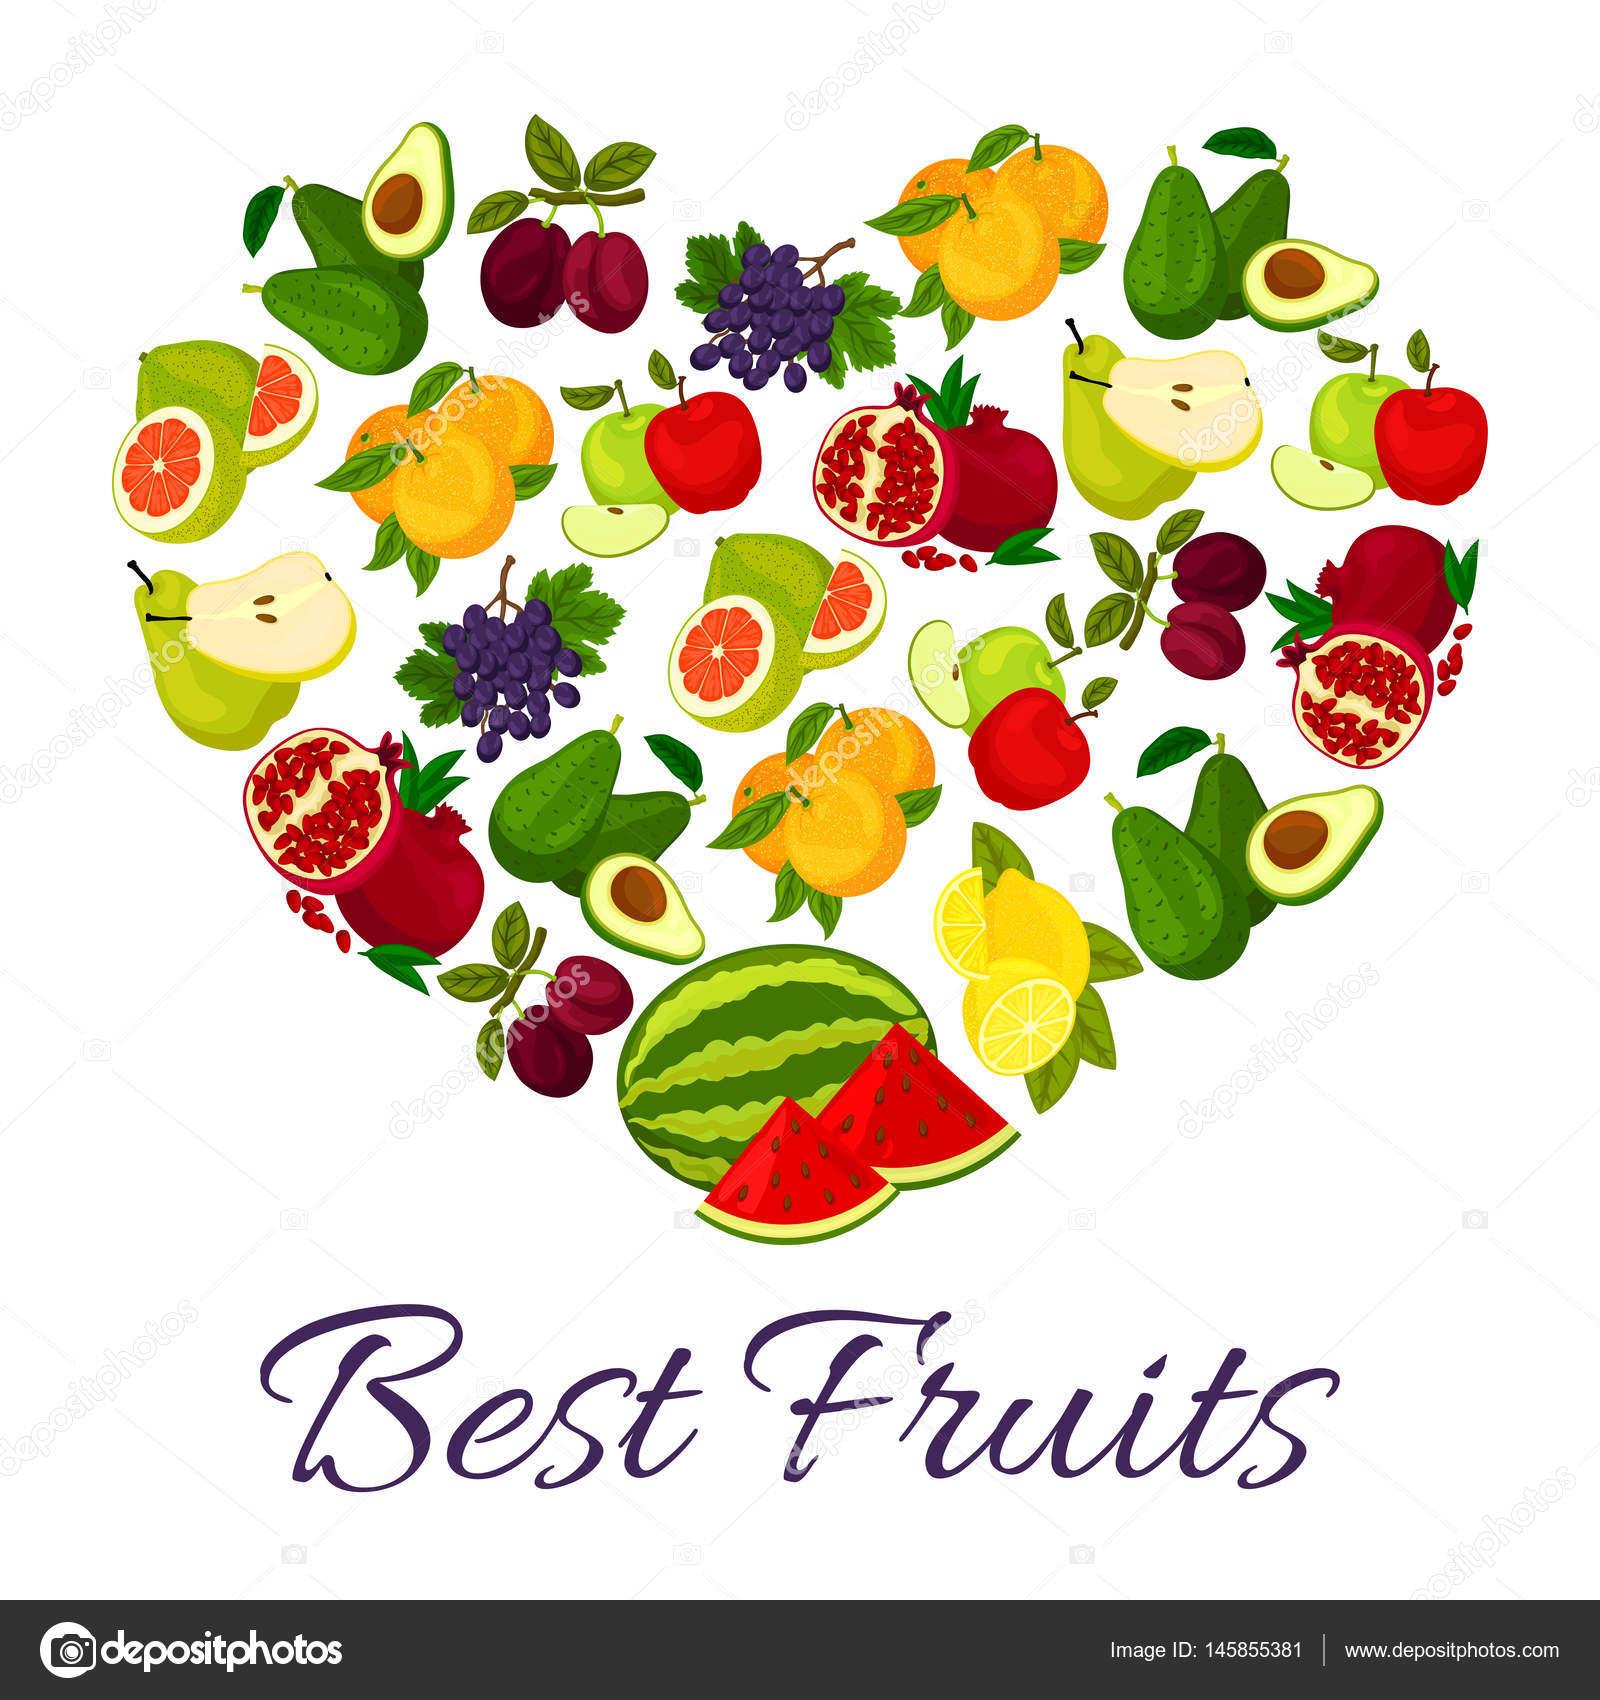 Fresh juicy fruits in heart symbol stock vector seamartini fresh juicy fruits in heart symbol stock vector biocorpaavc